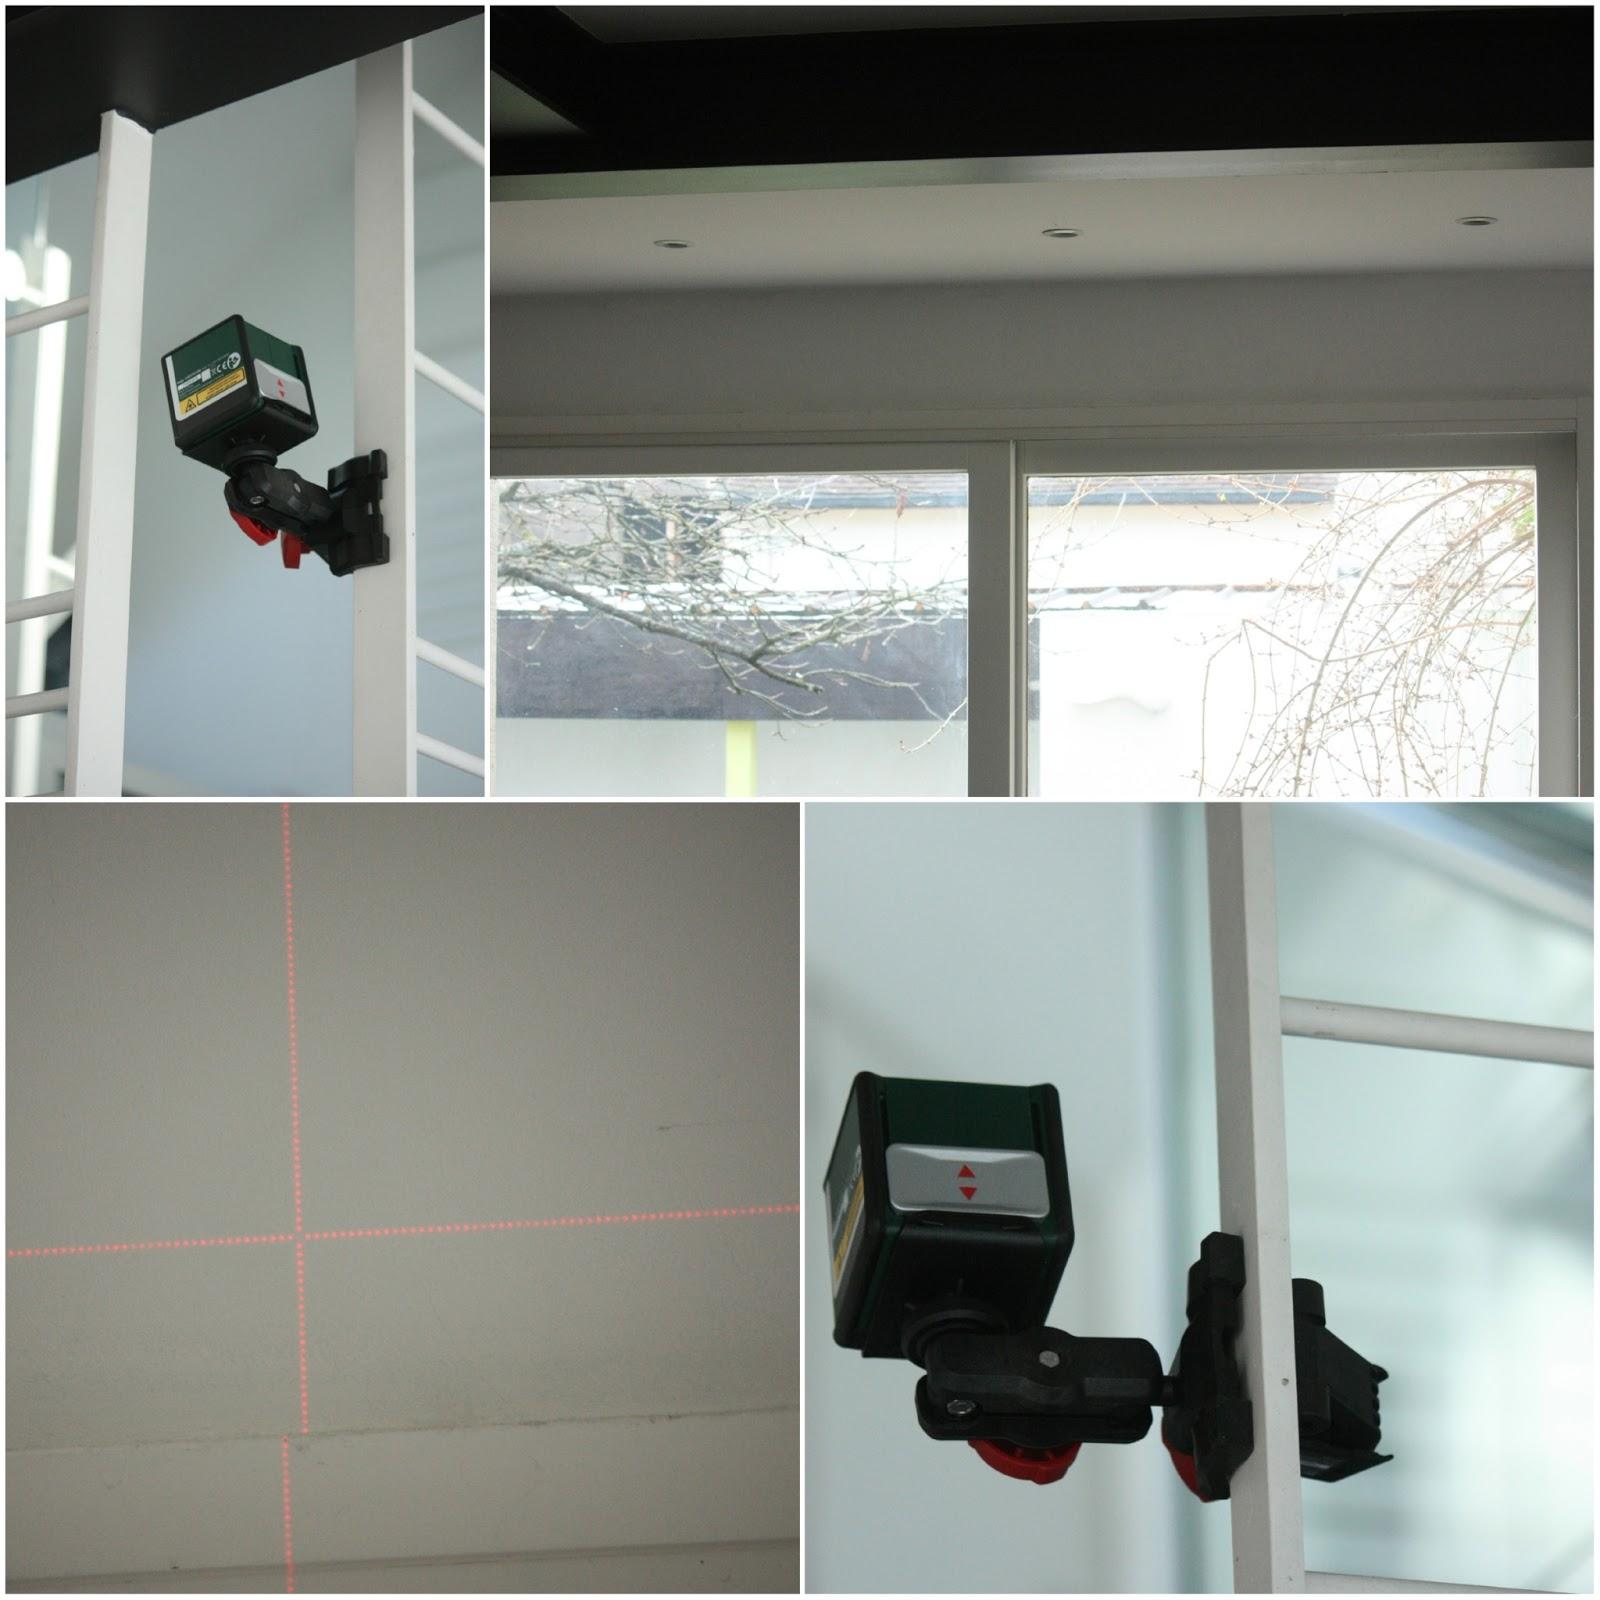 Un nouveau regard niveau laser quigo 2 par bosch for Niveau laser bosch quigo 2